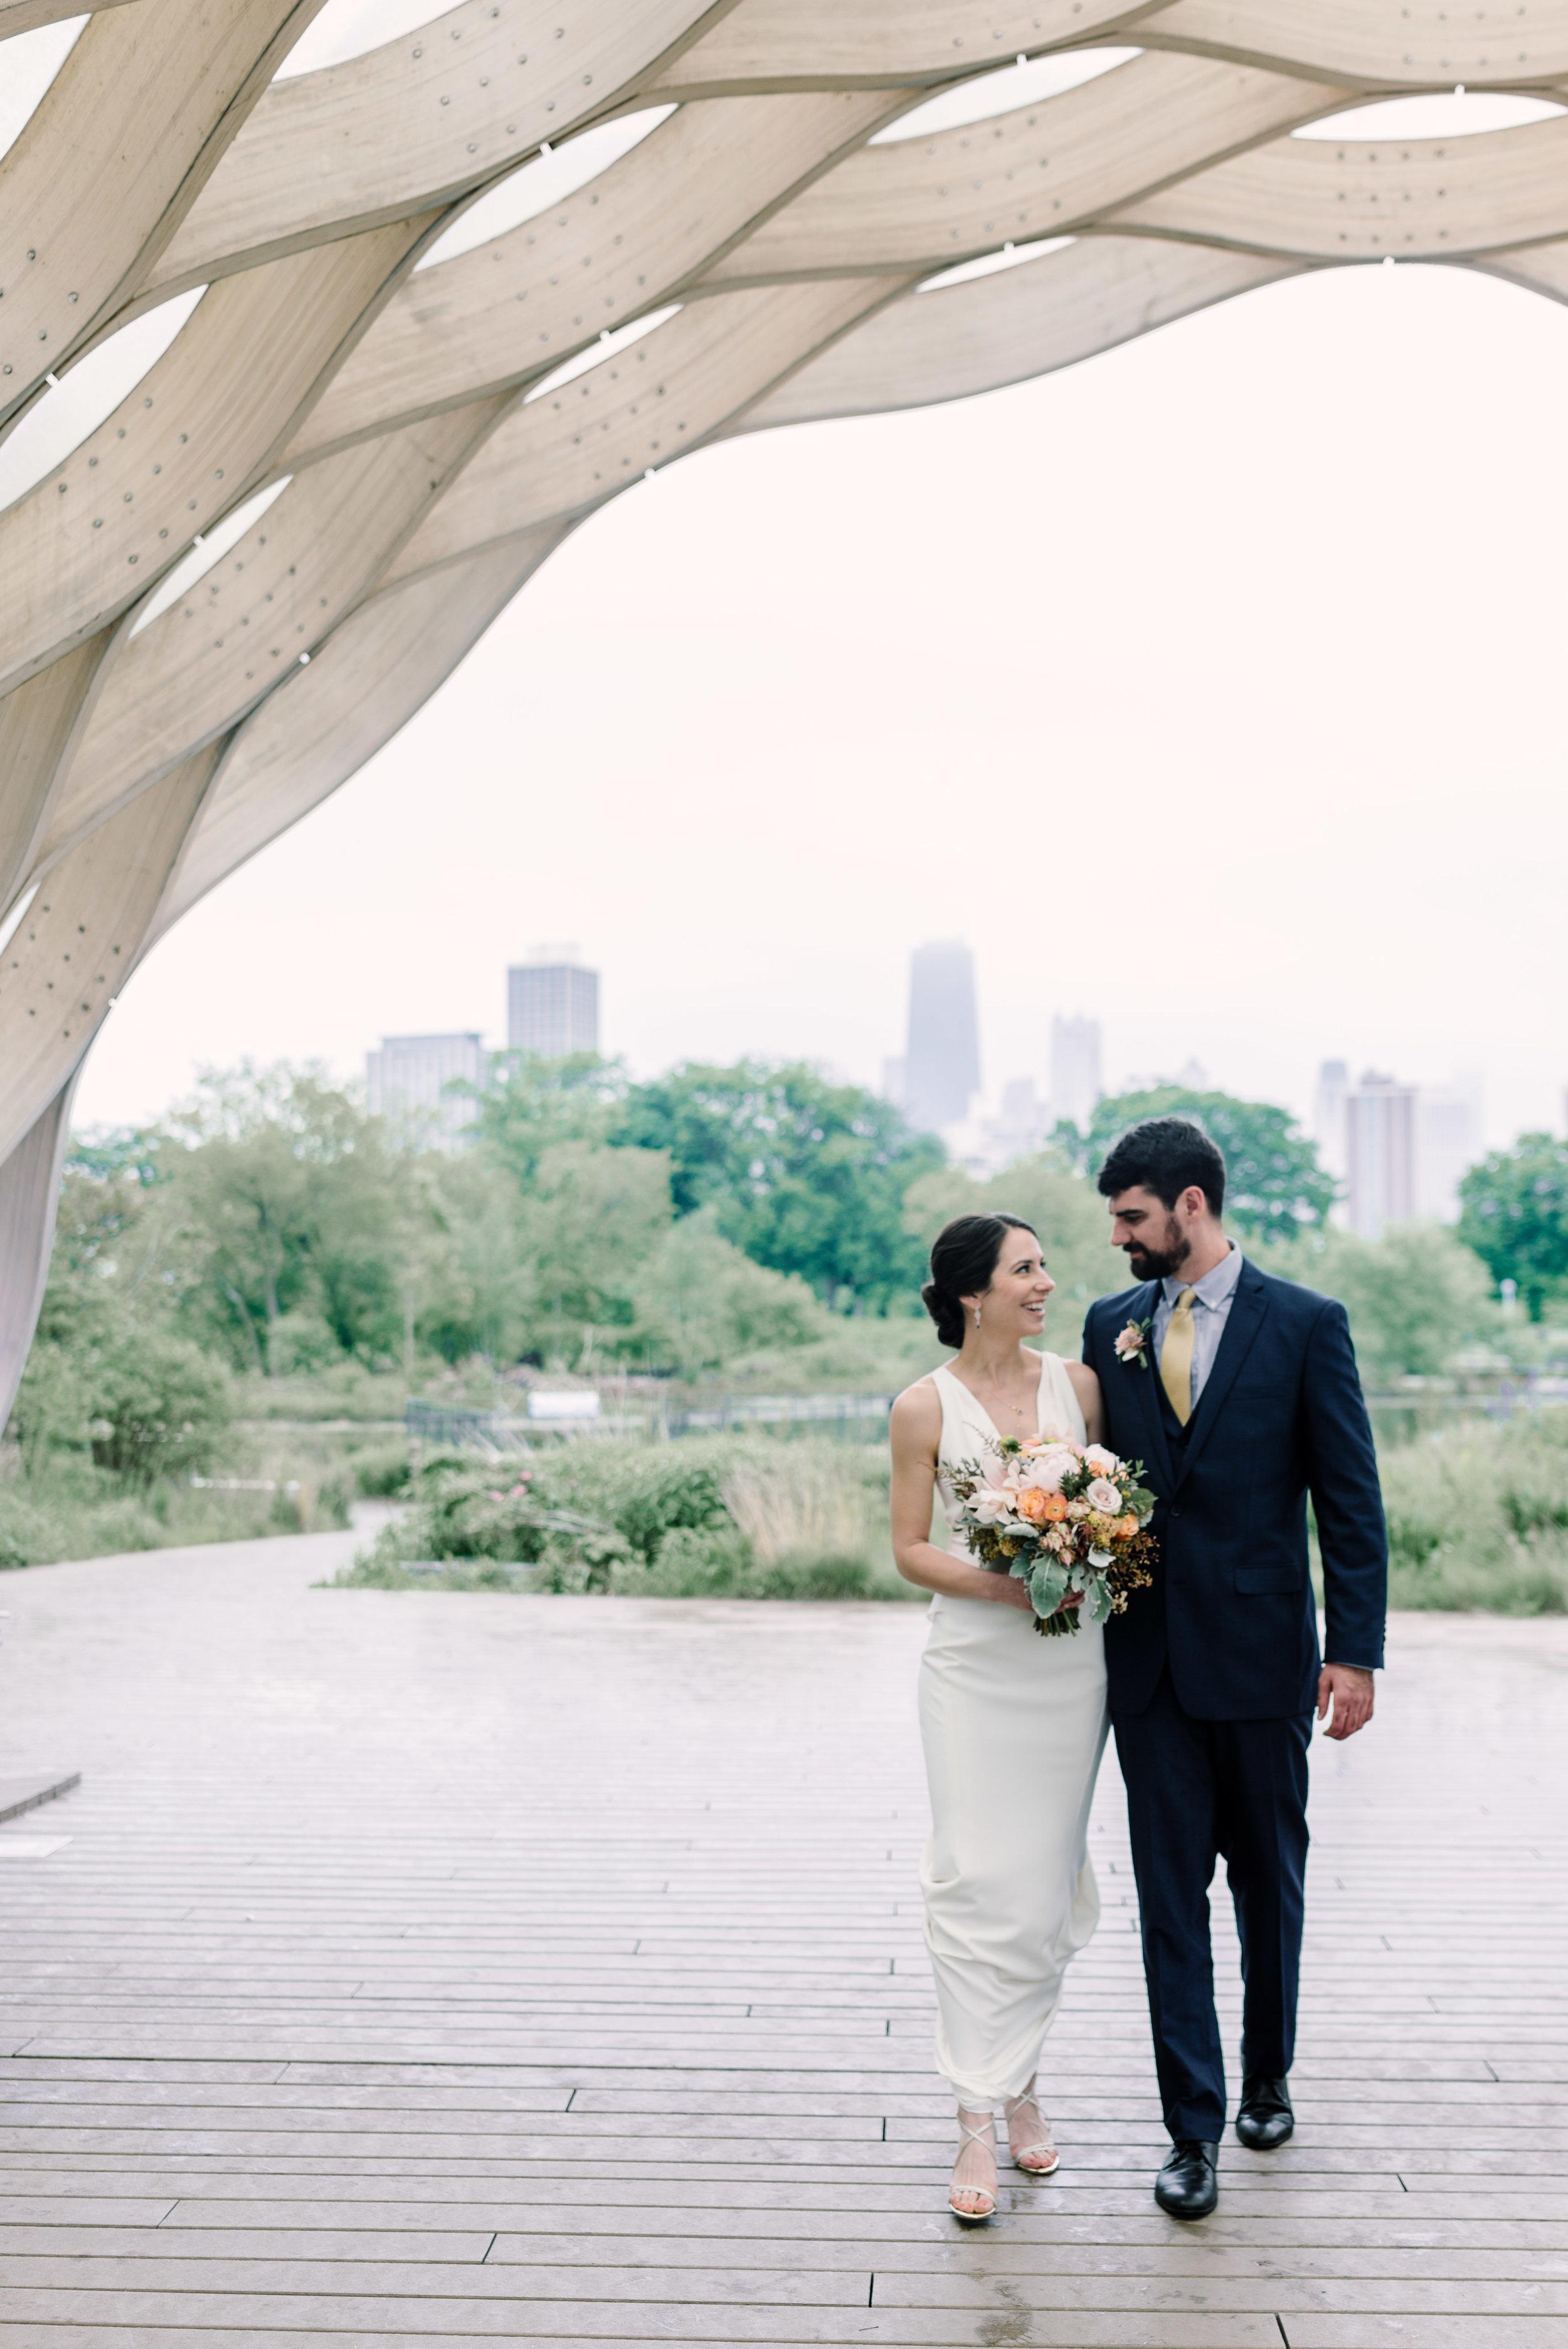 Patricia-Steve-Blog-Indianapolis-Wedding-39.jpg